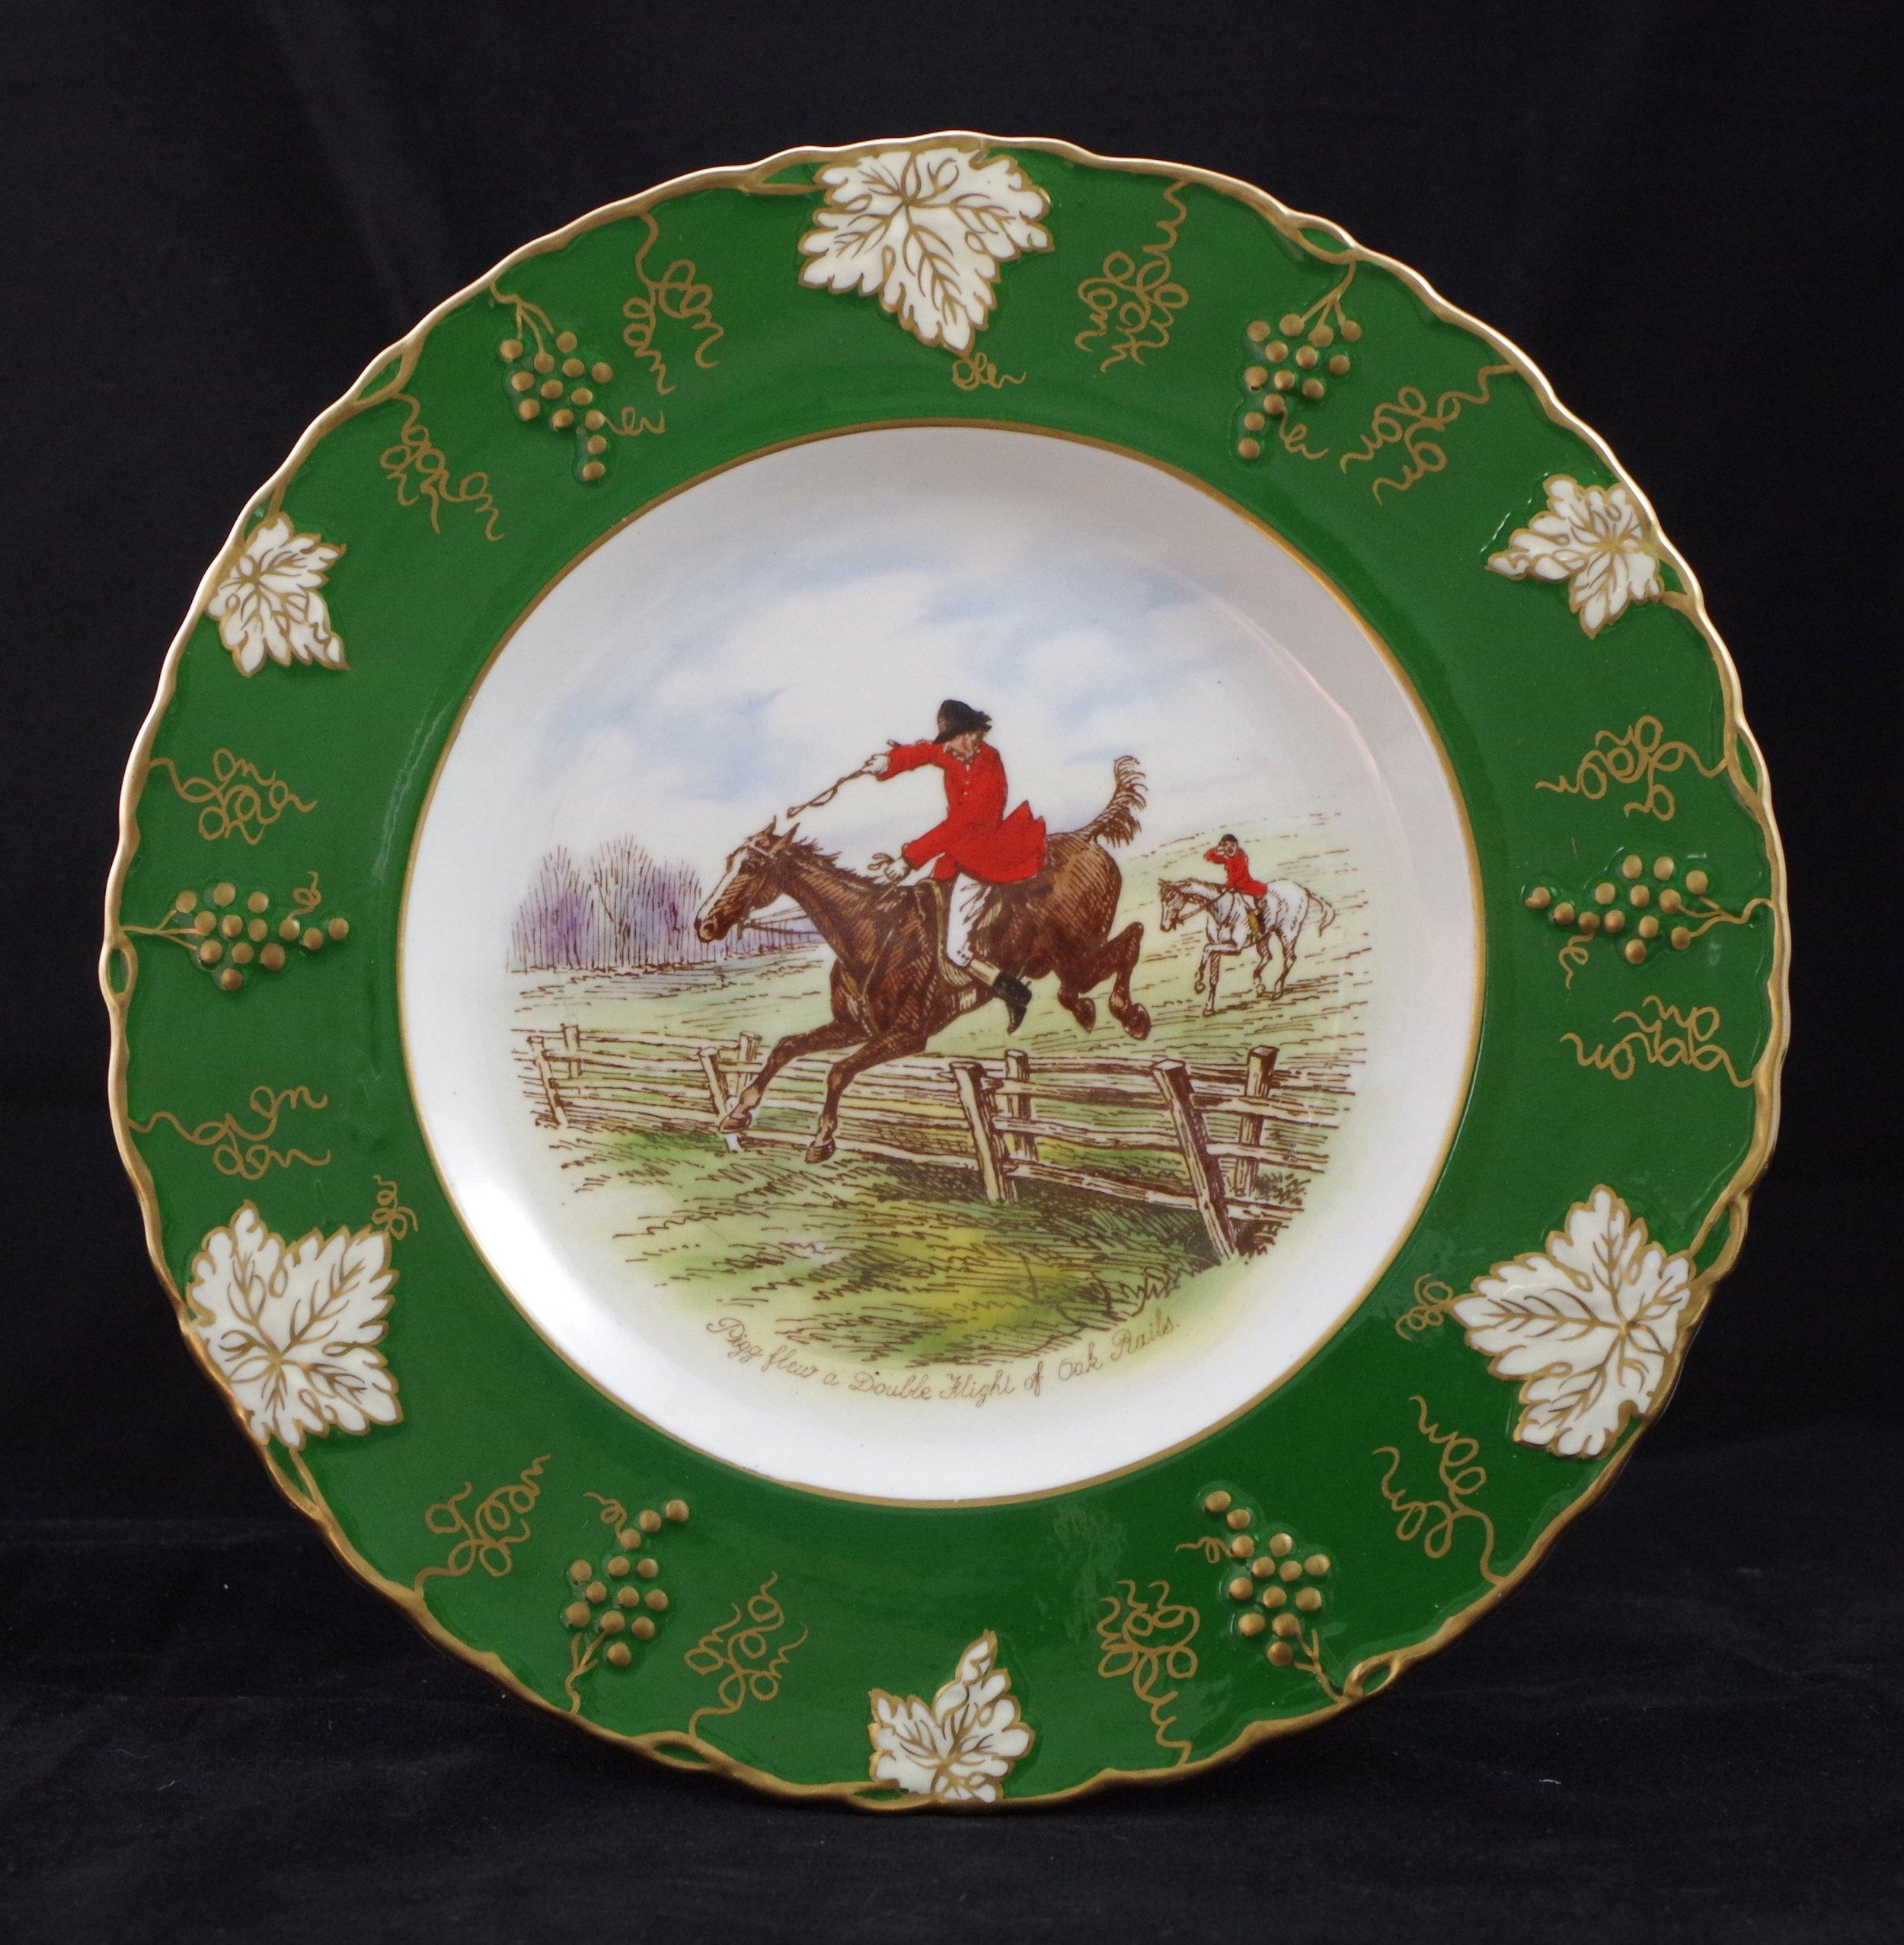 royal-crown-derby-vine-siam-green-ground-jorrocks-2